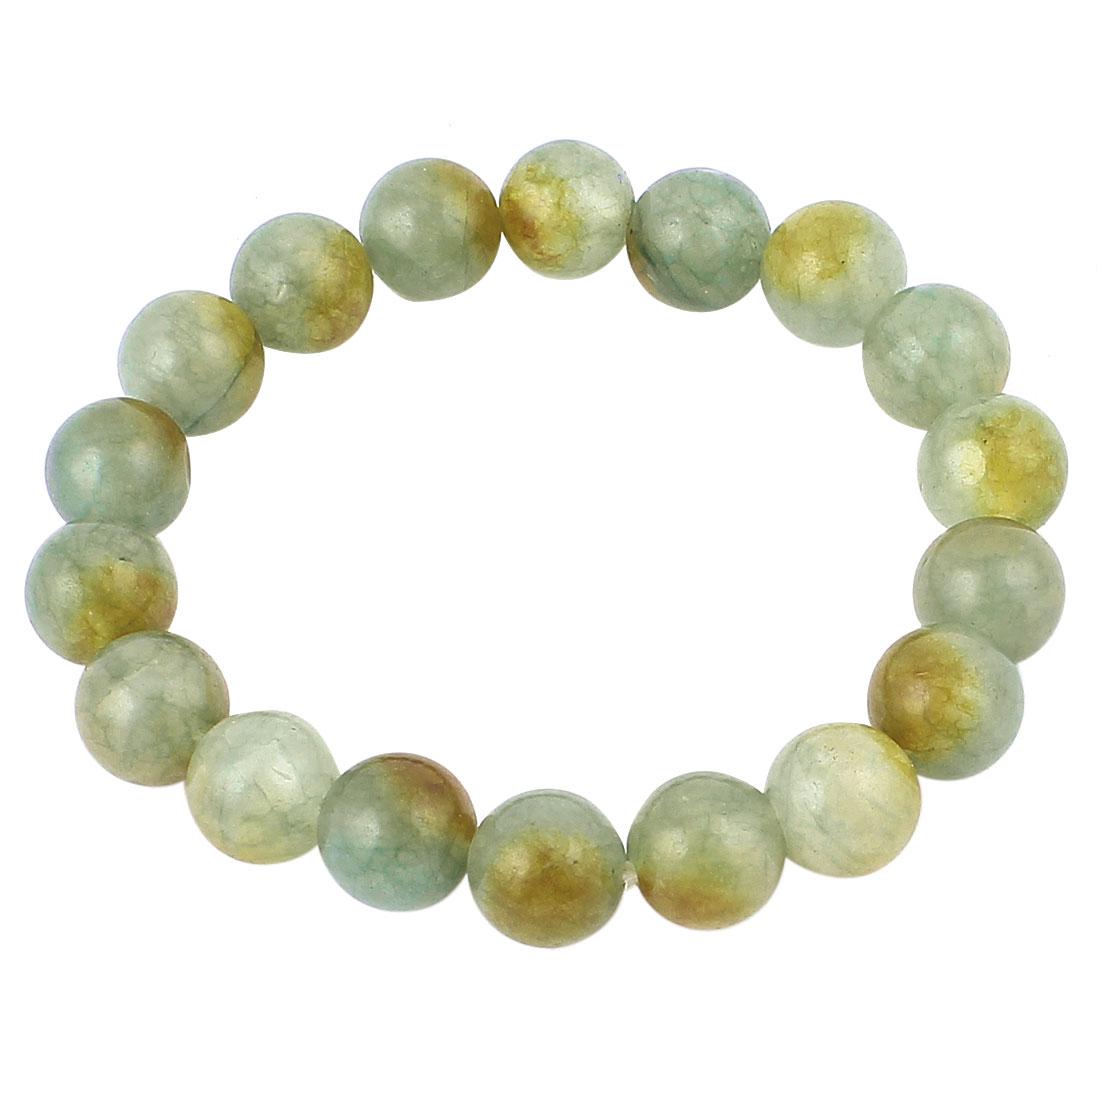 Lady Jewelry Faux Jade Beads Decor Elastic Wrist Bangle Bracelet Pale Green